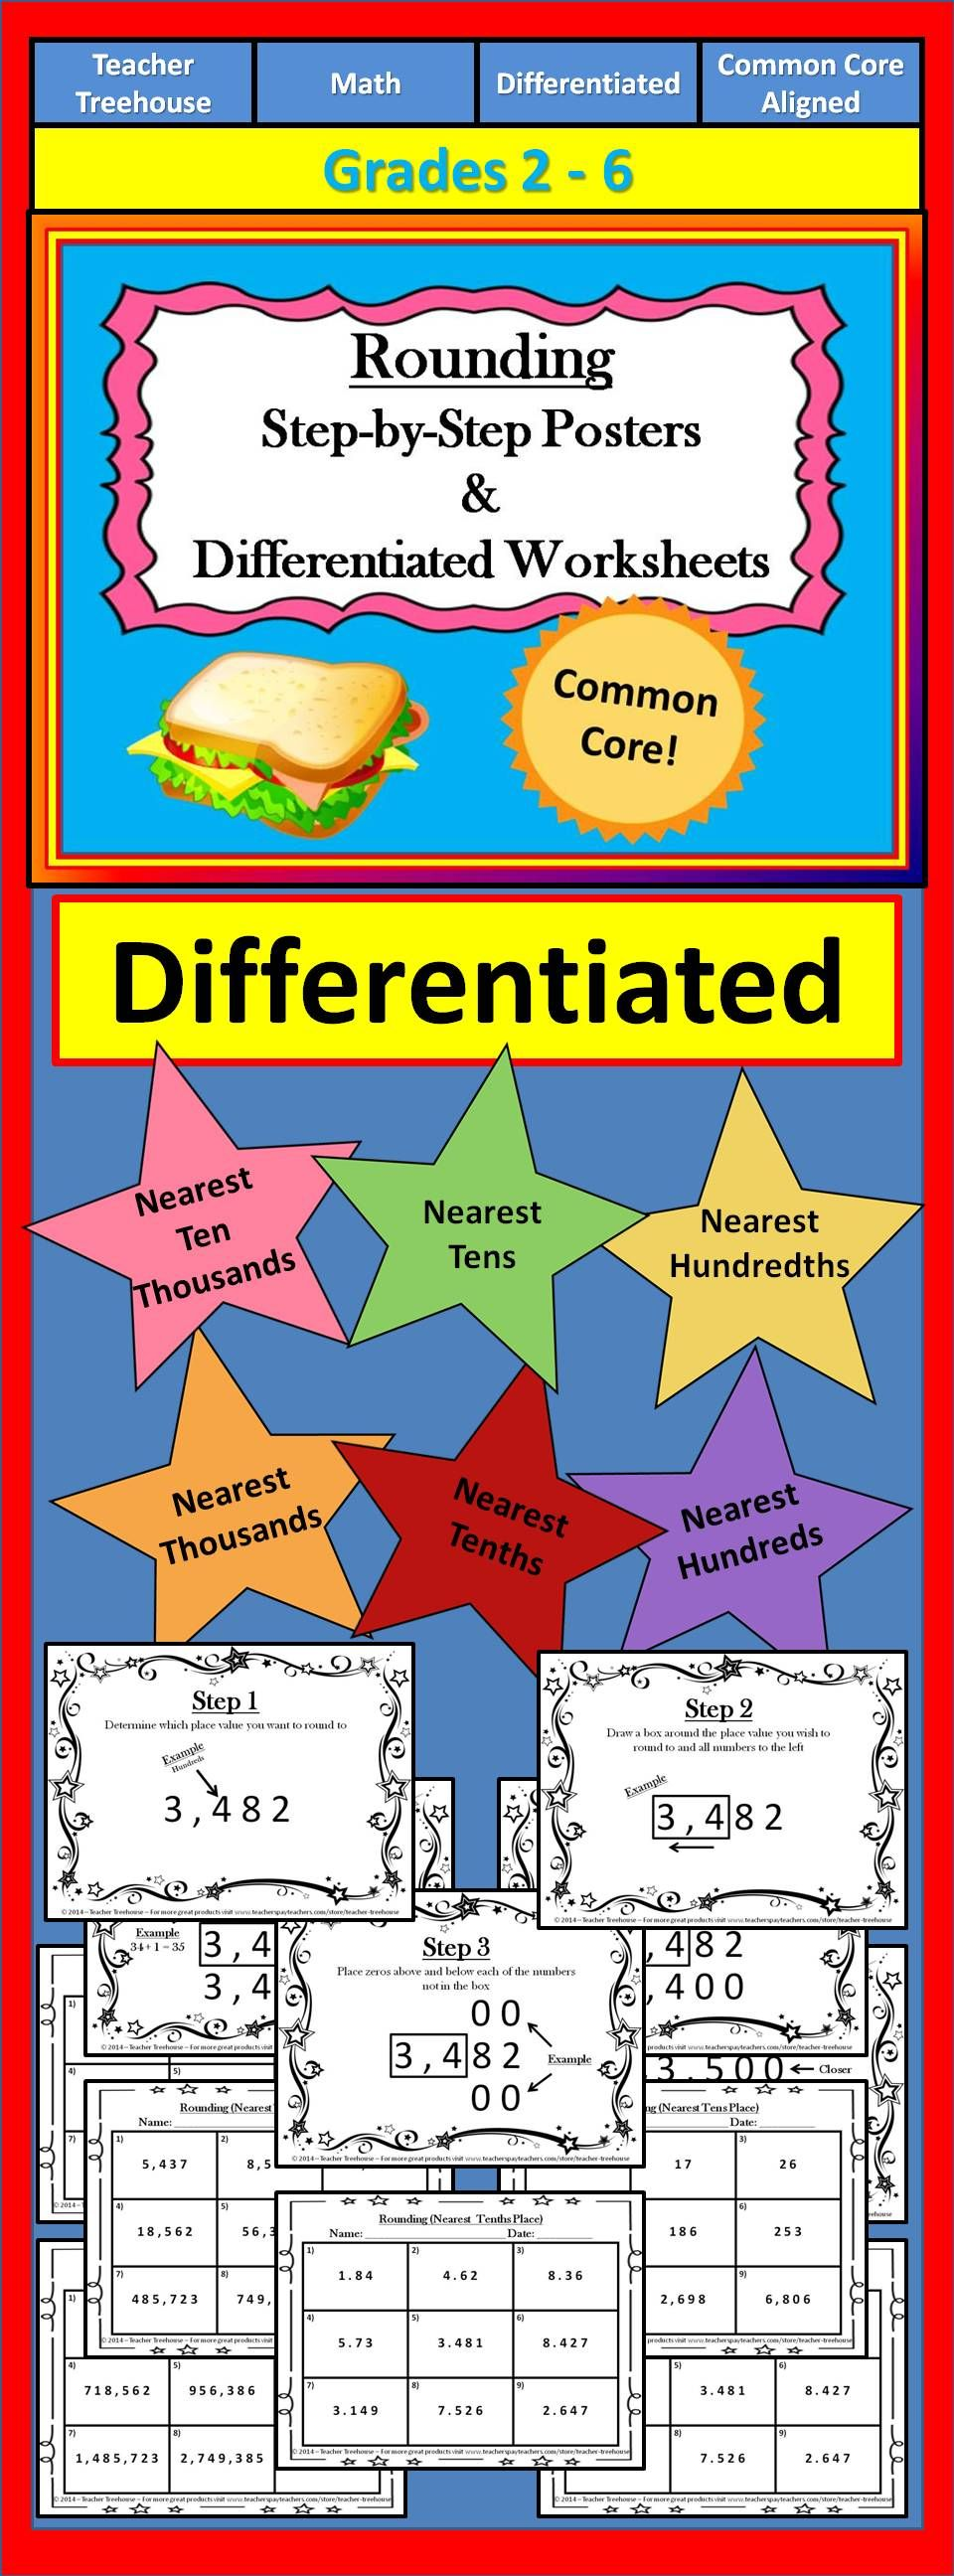 rounding worksheets - rounding posters - rounding decimals